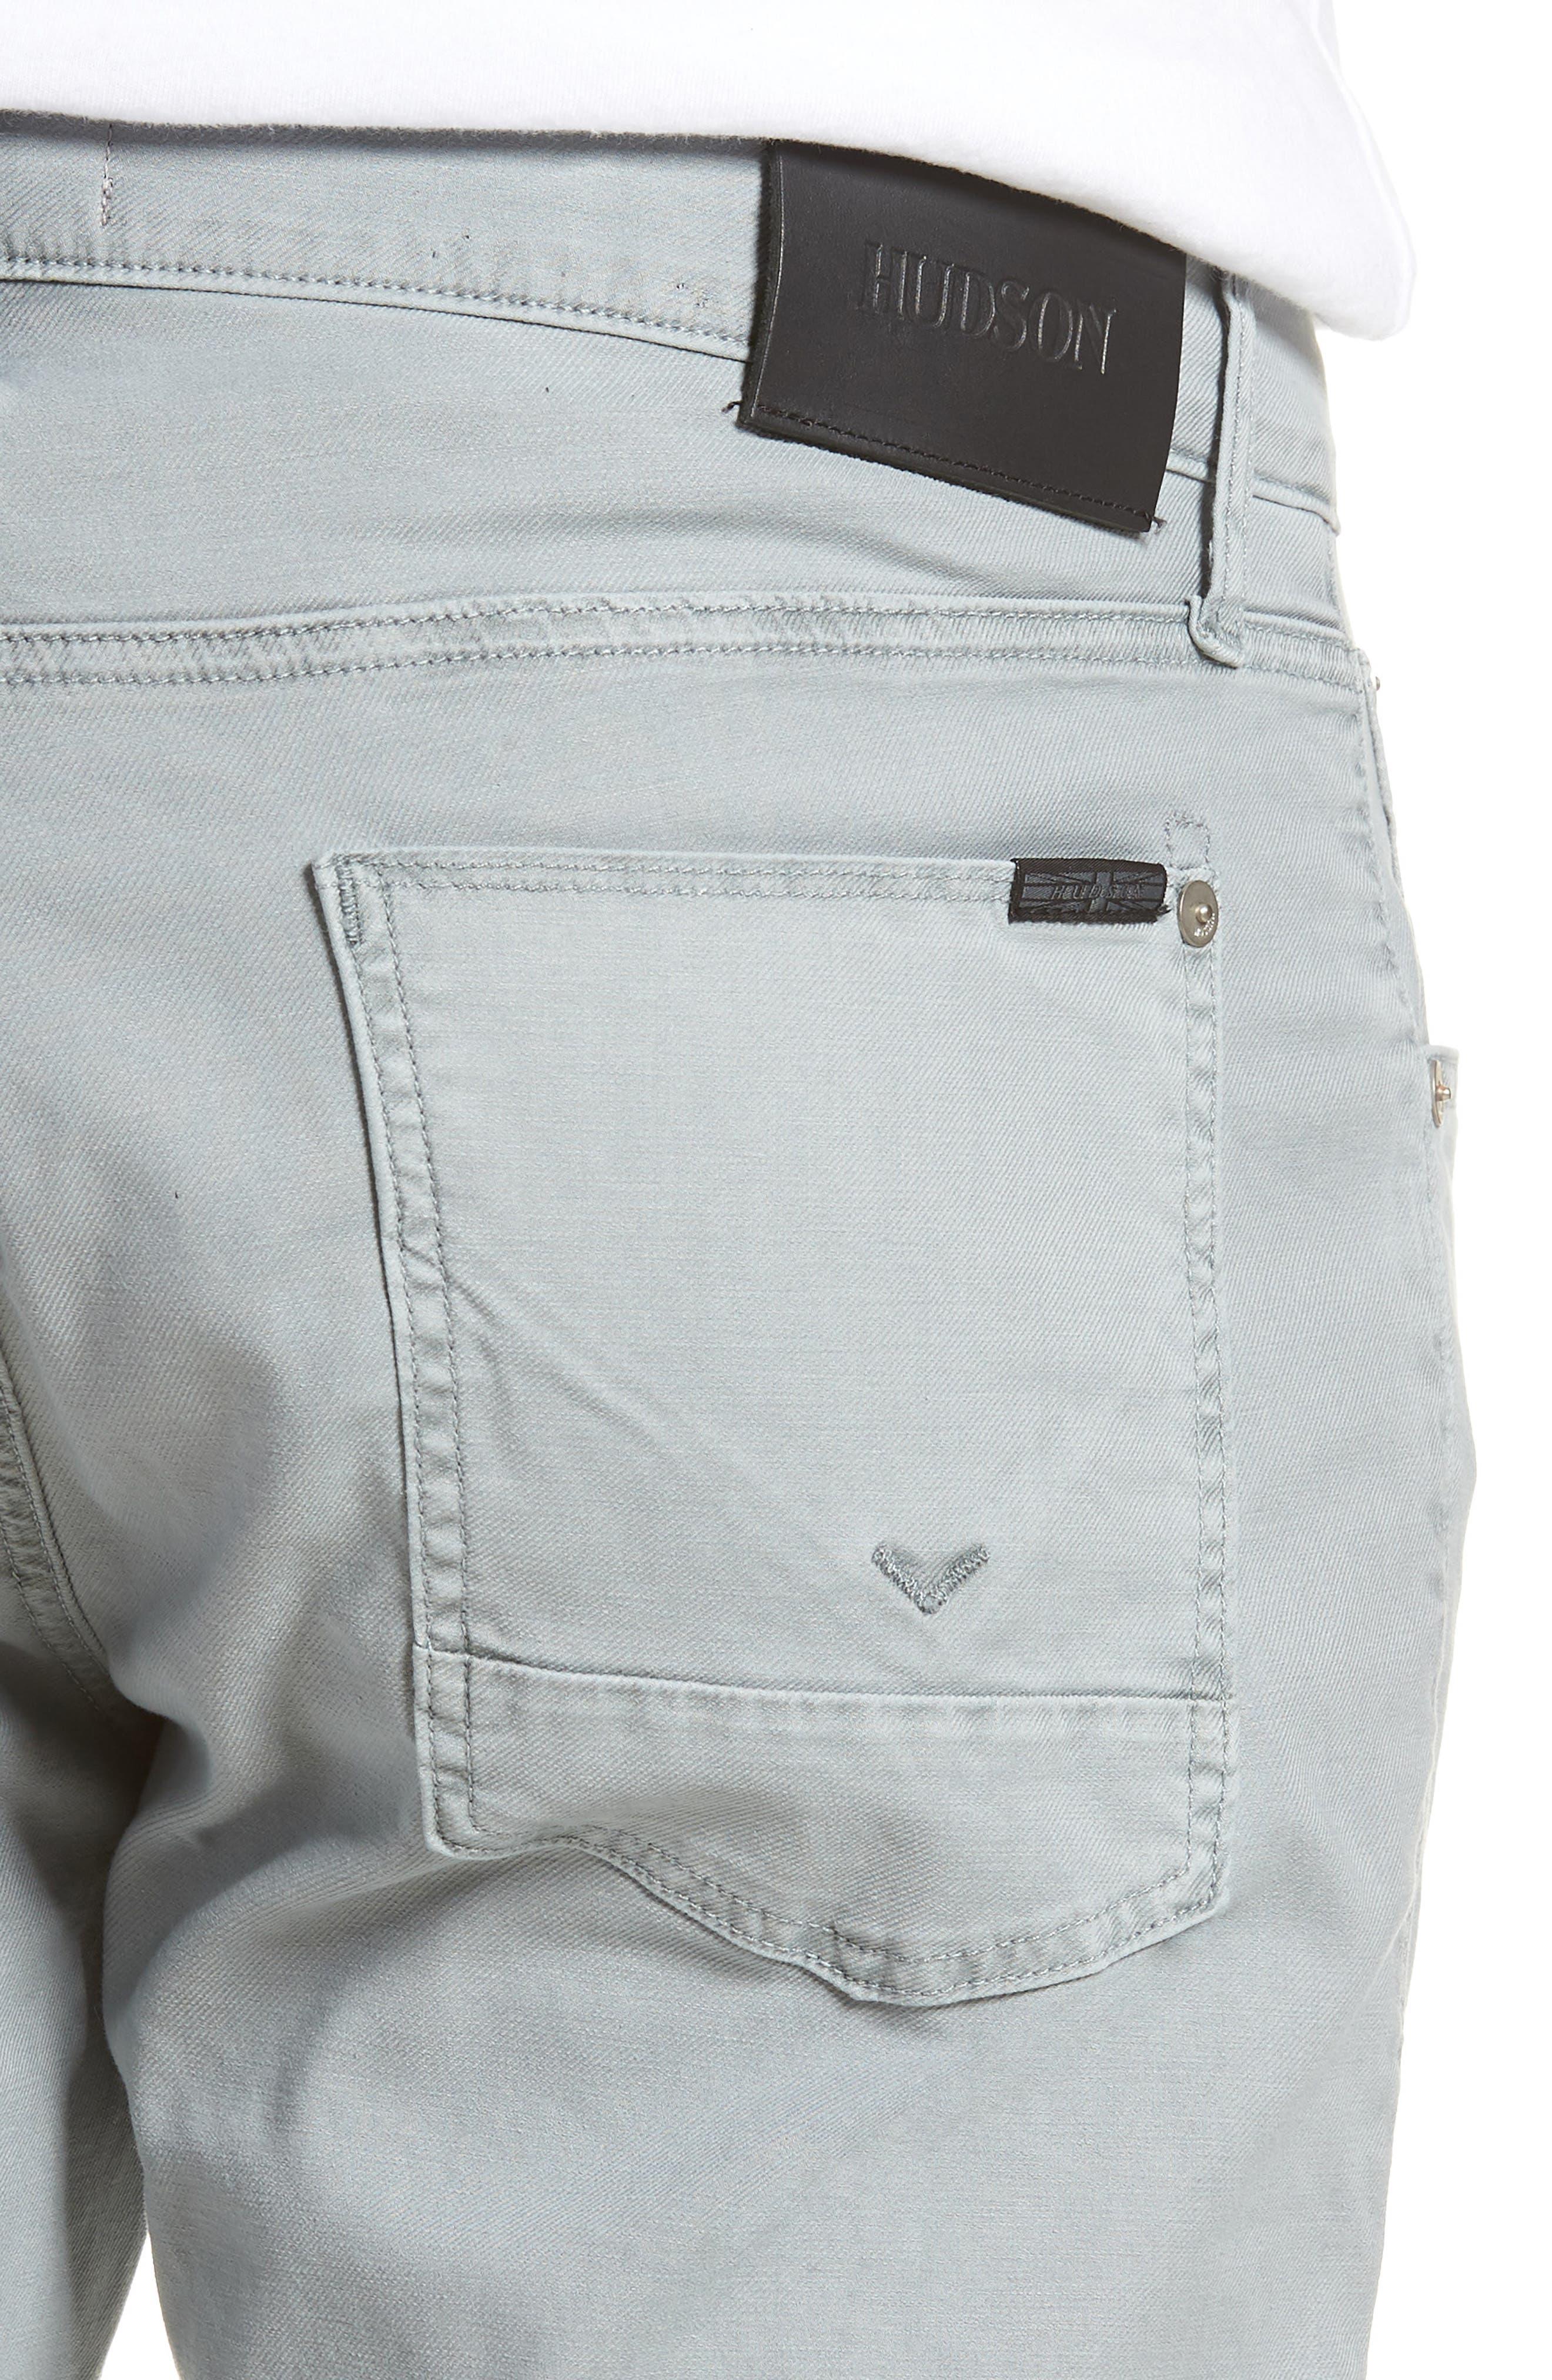 Blake Slim Fit Jeans,                             Alternate thumbnail 4, color,                             Steel Blue